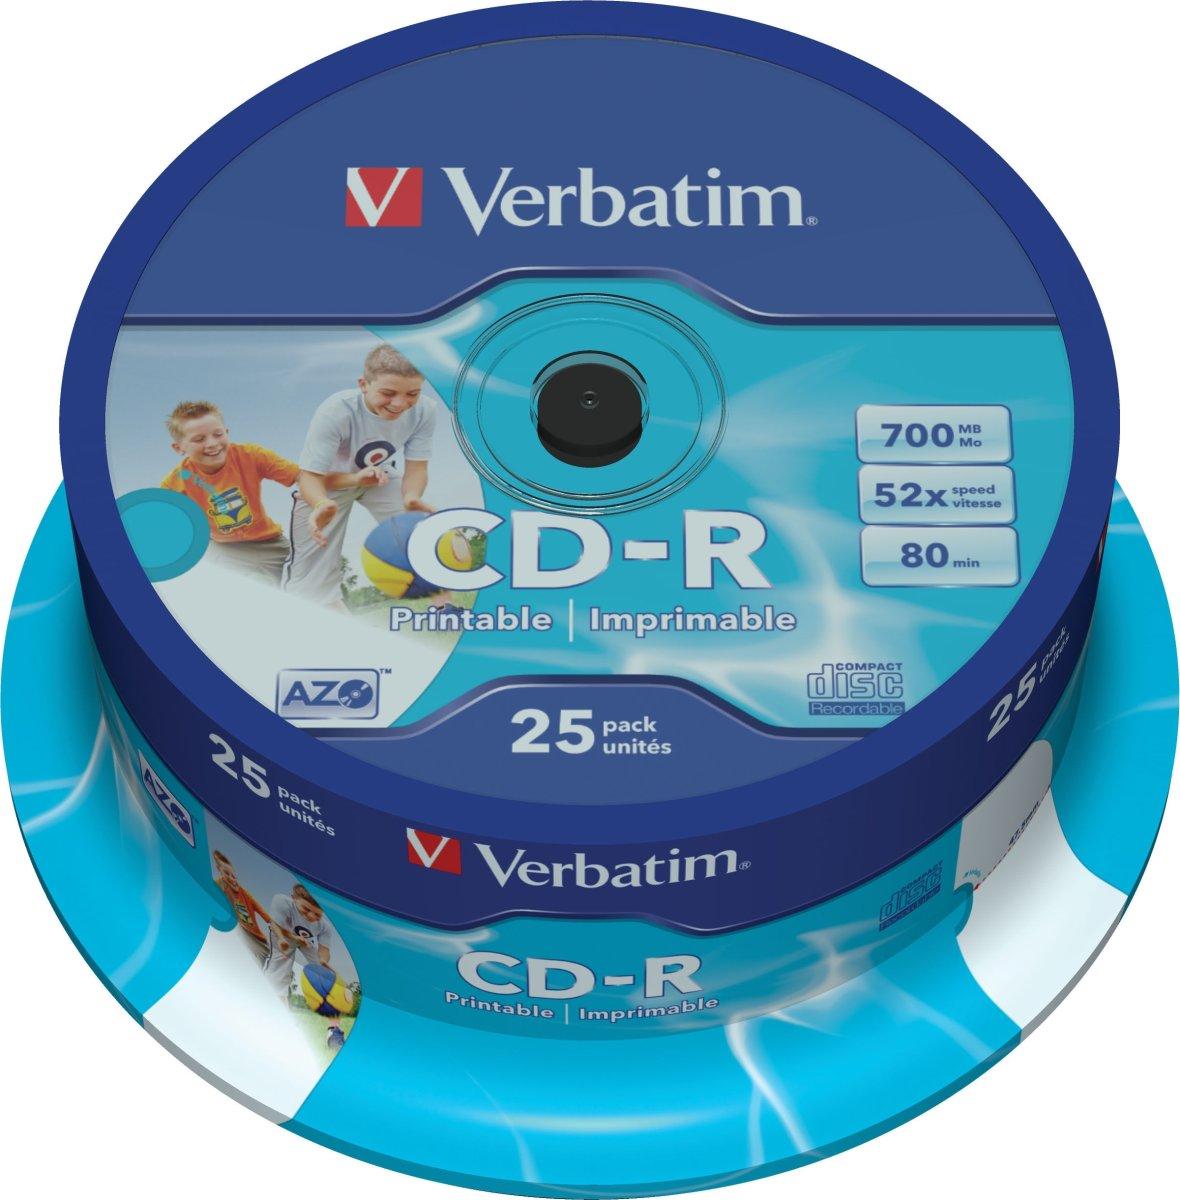 Verbatim CD-R 700mb/80min printable, 25stk